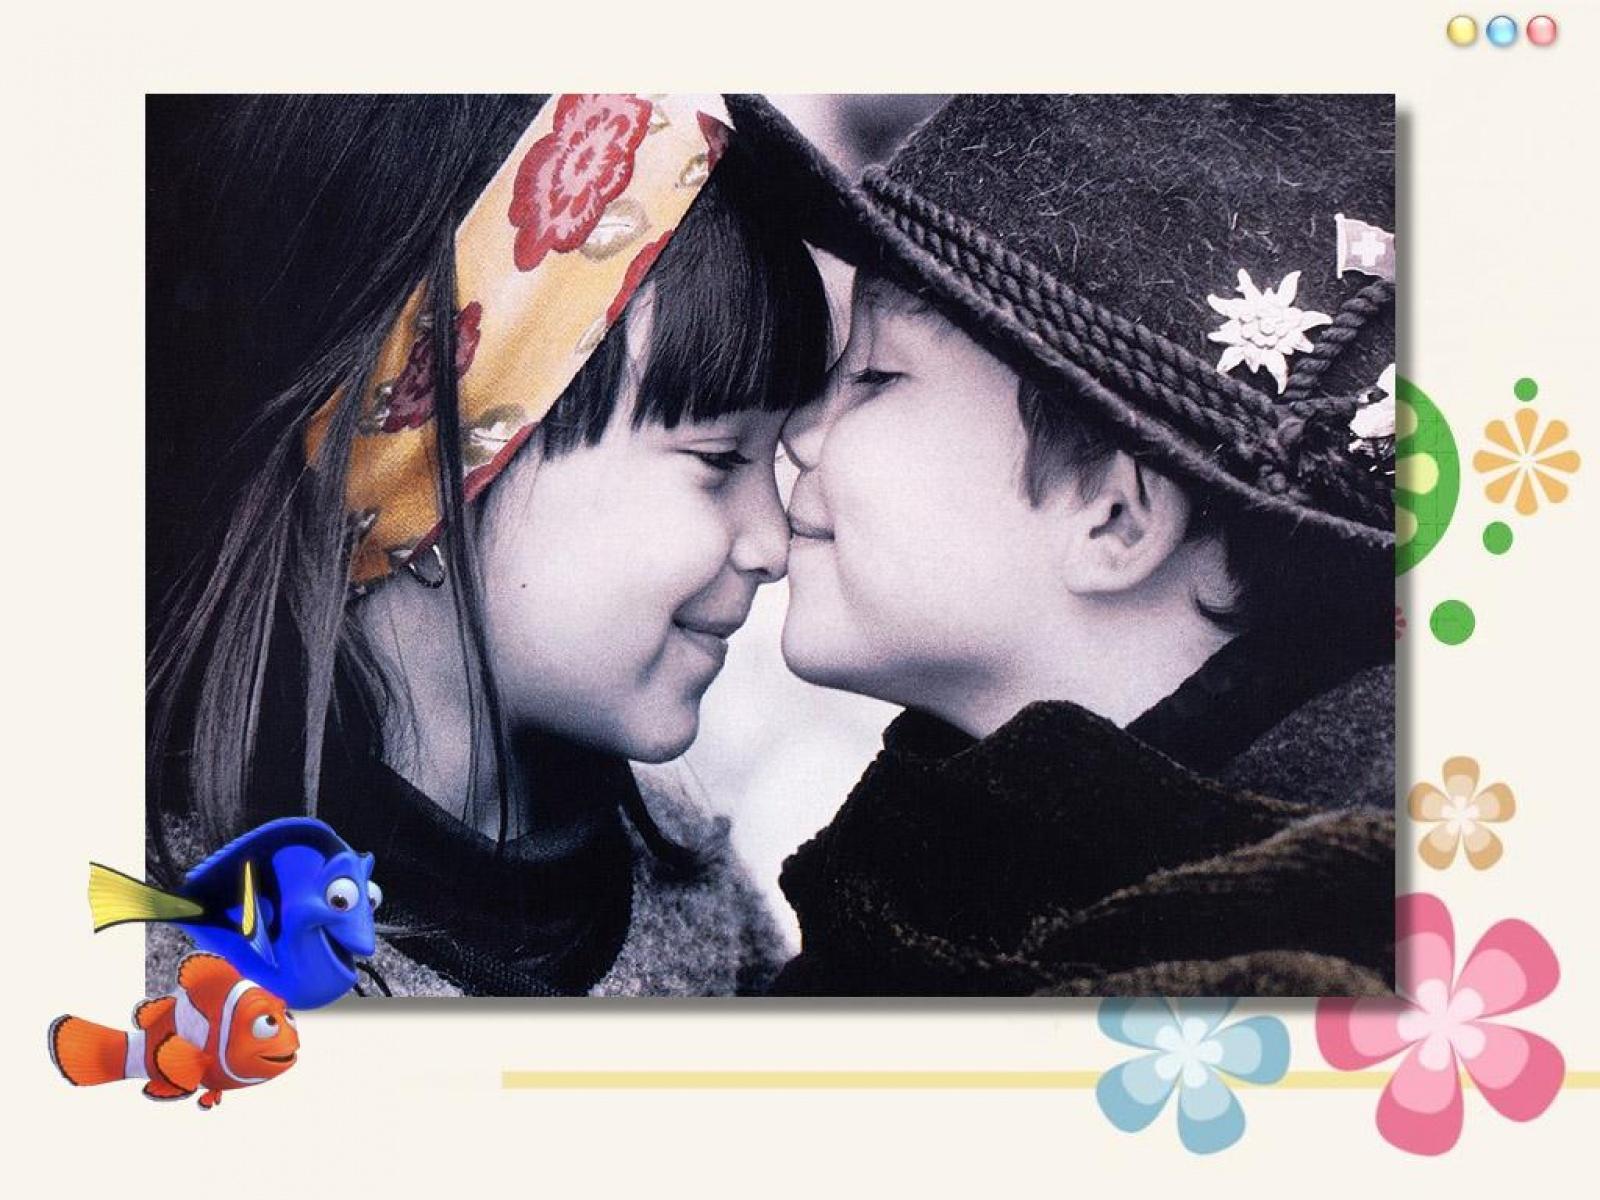 Cute Love Couple Hd Wallpaper - Love Romantic Cute Baby Couple - HD Wallpaper